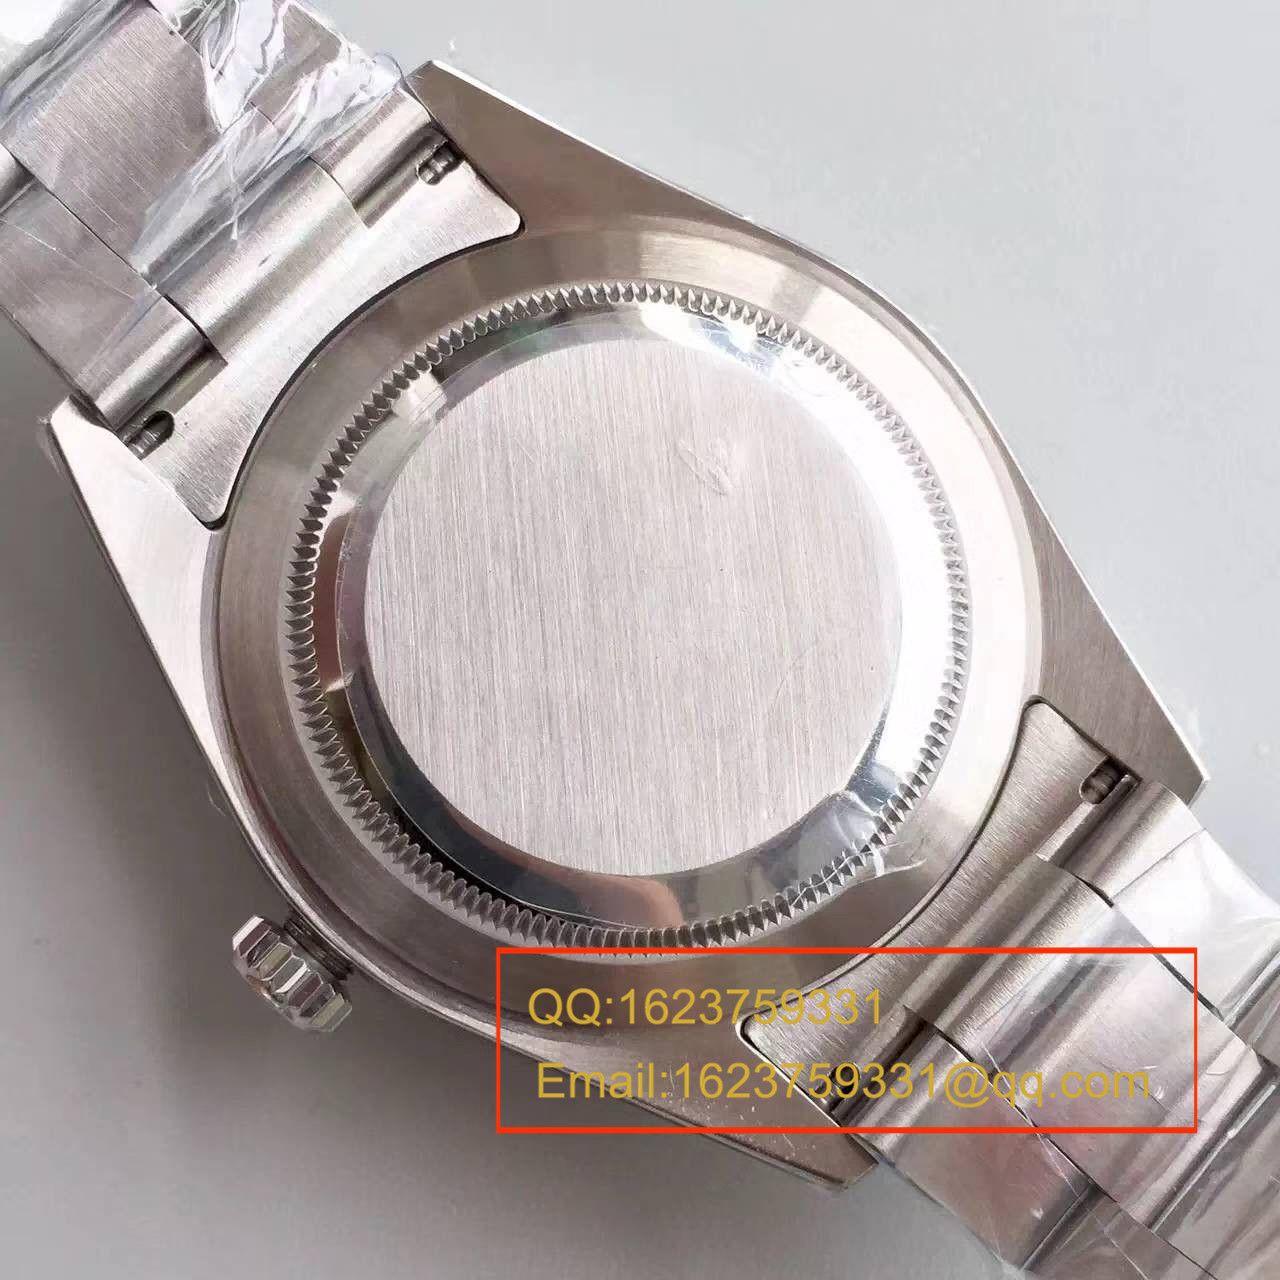 【JF厂1:1精仿手表】劳力士MILGAUSS系列116400-GV-72400蓝盘腕表《蓝色闪电》 / R001